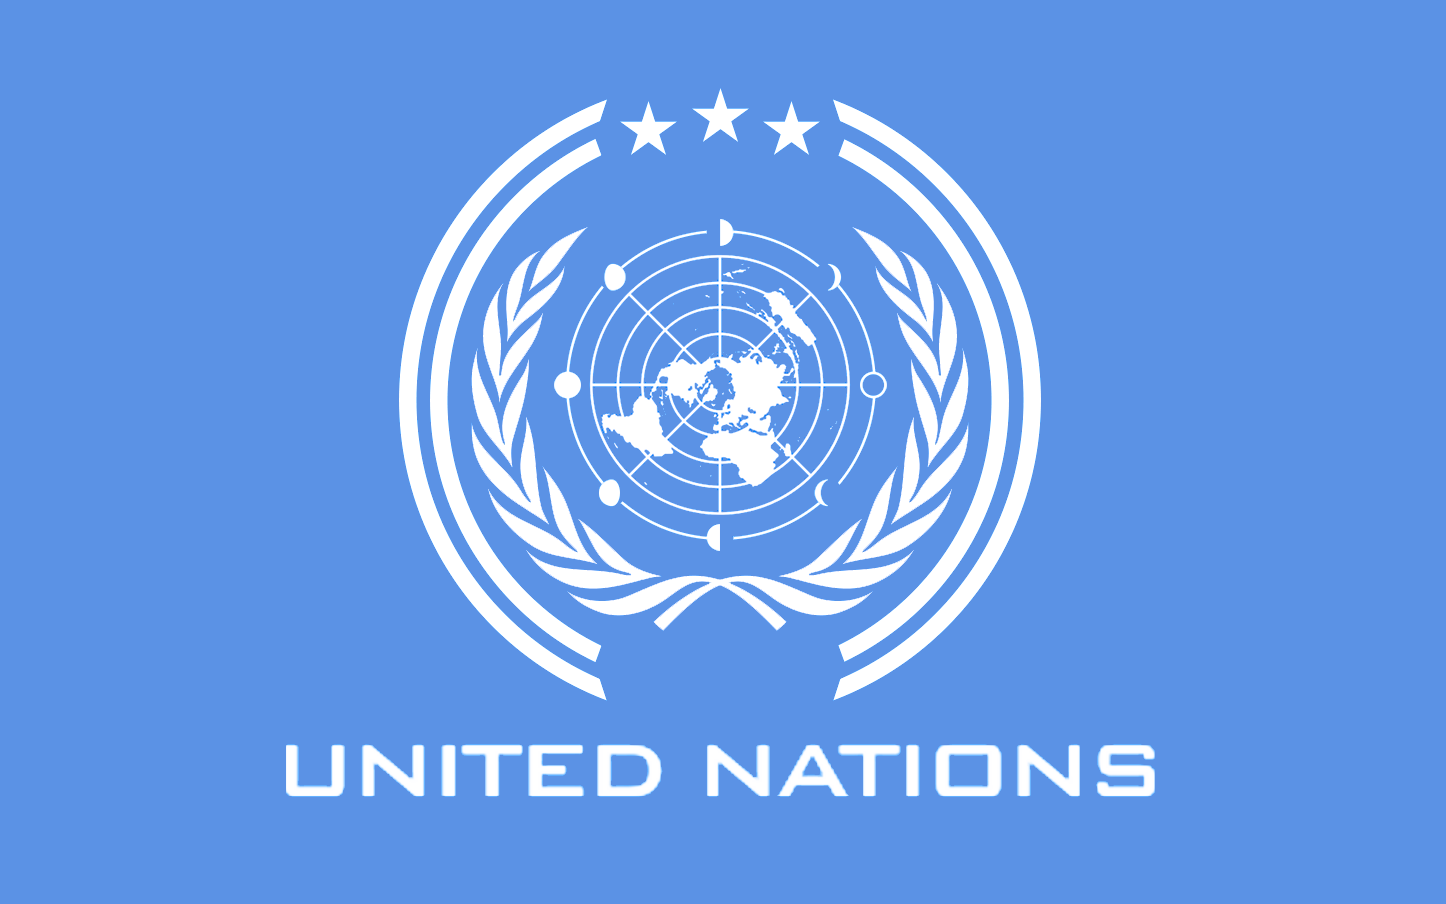 Daily Current Affairs - FinMin Joint Secretary Rashmi R Das appointed to UN Tax Committee | FinMin இணை செயலாளர் ரஷ்மி ஆர் தாஸ் ஐ.நா வரிக்குழுவில் நியமிக்கப்பட்டார் |_40.1